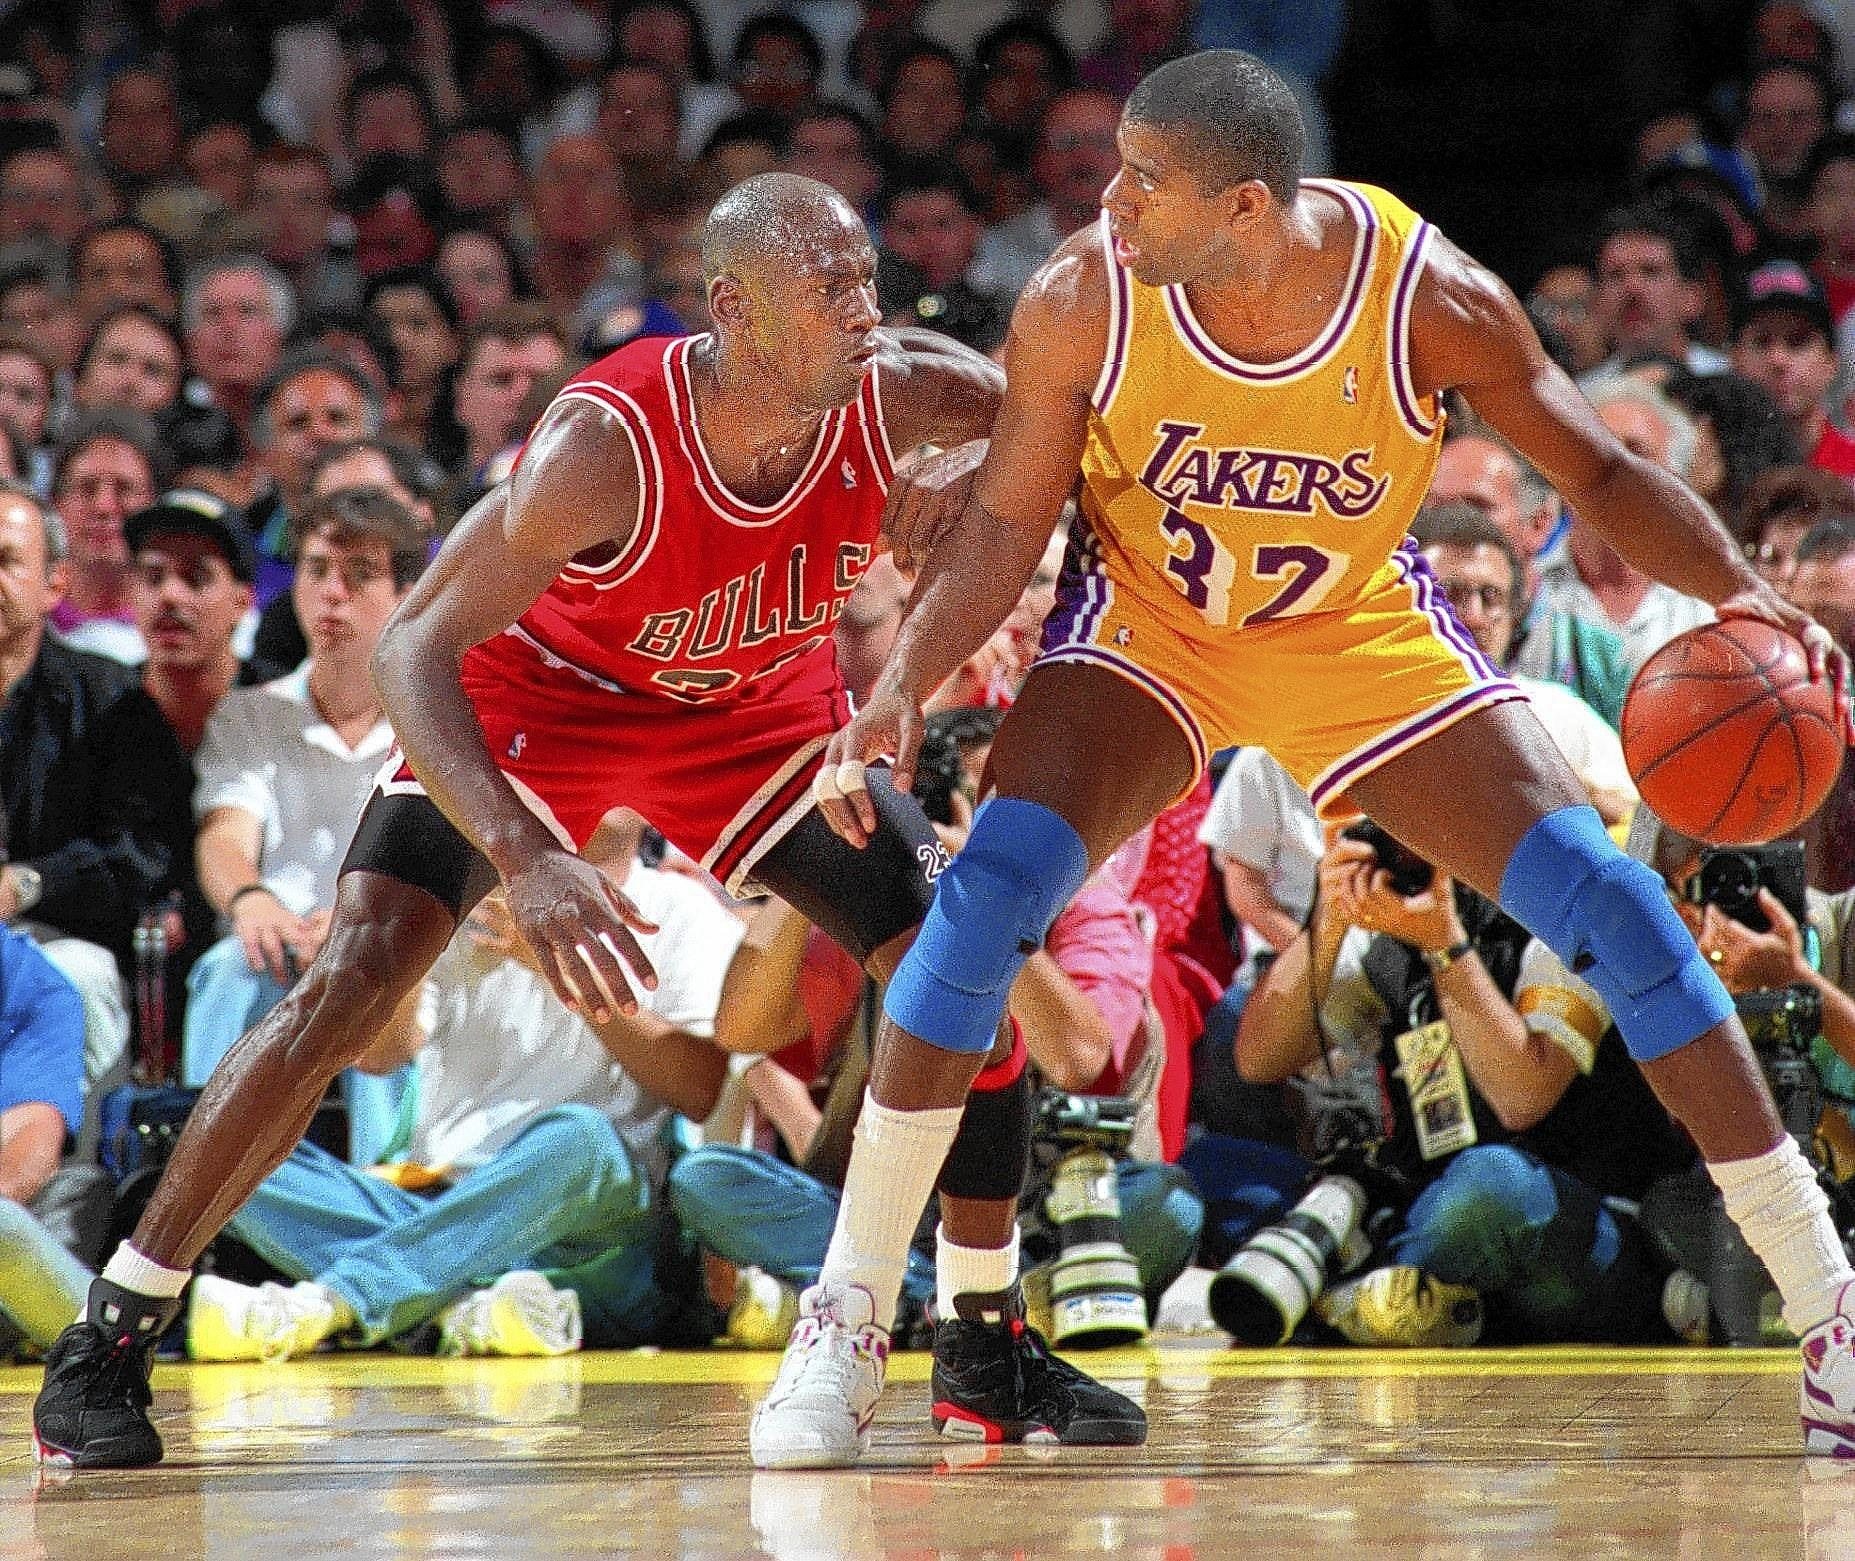 Bulls Roster With Jordan Bulls' Michael Jordan